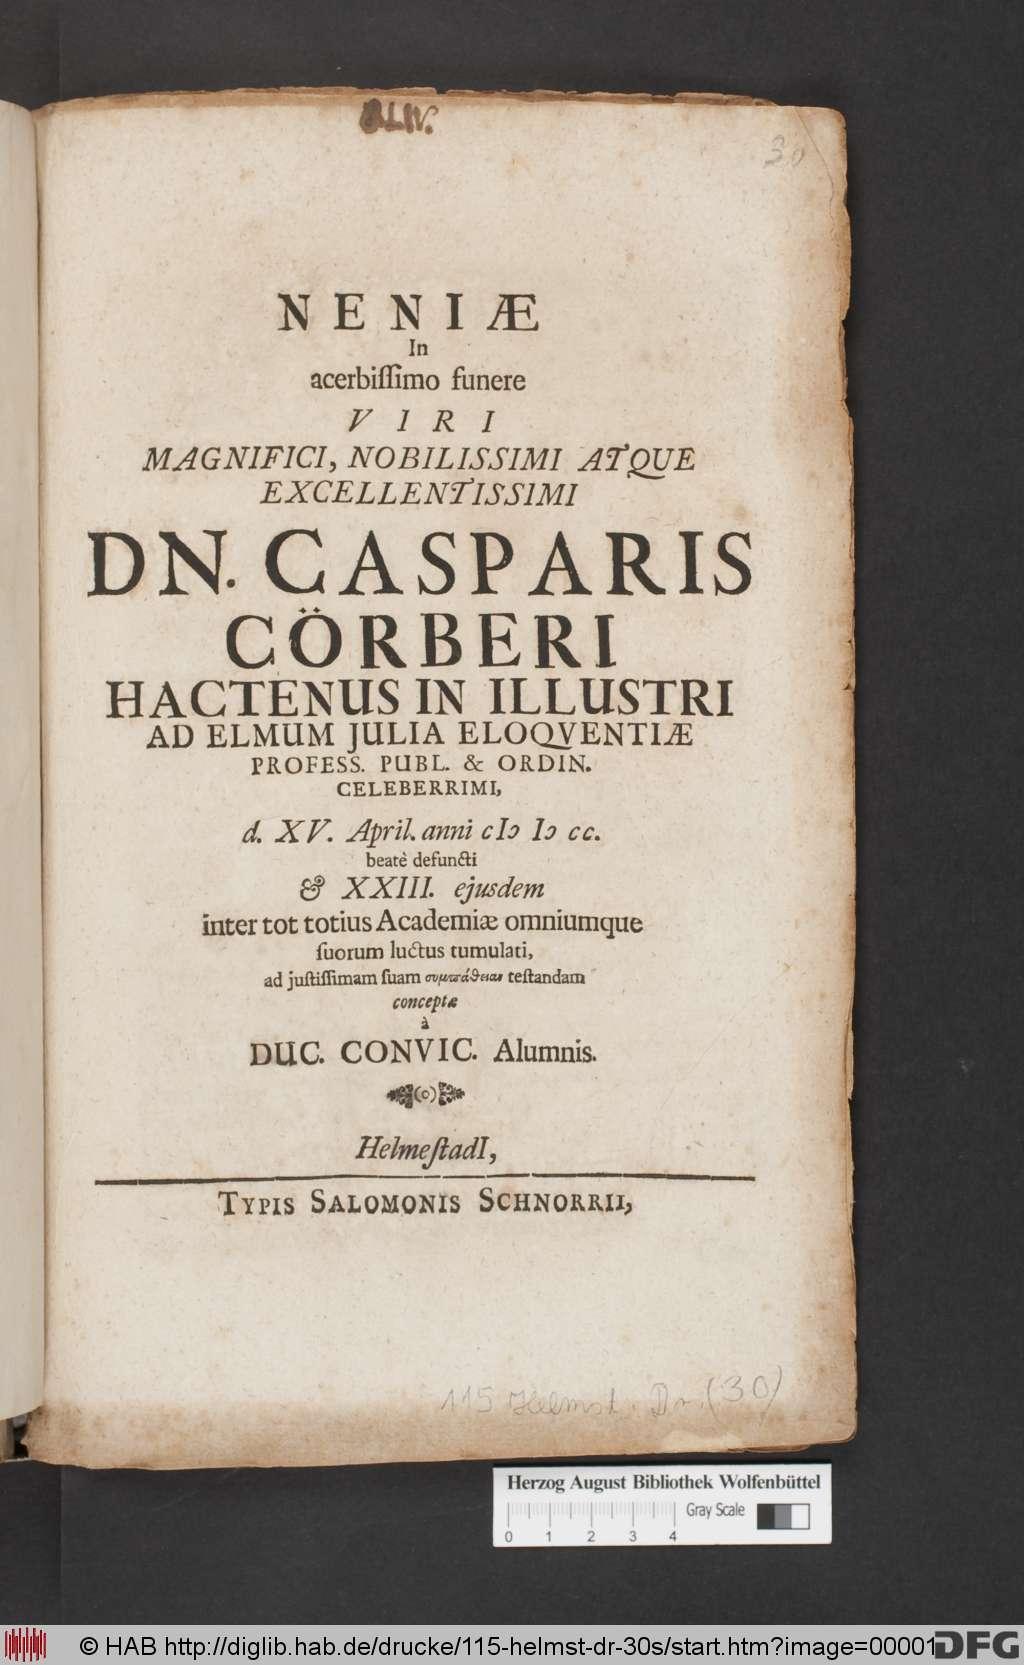 http://diglib.hab.de/drucke/115-helmst-dr-30s/00001.jpg